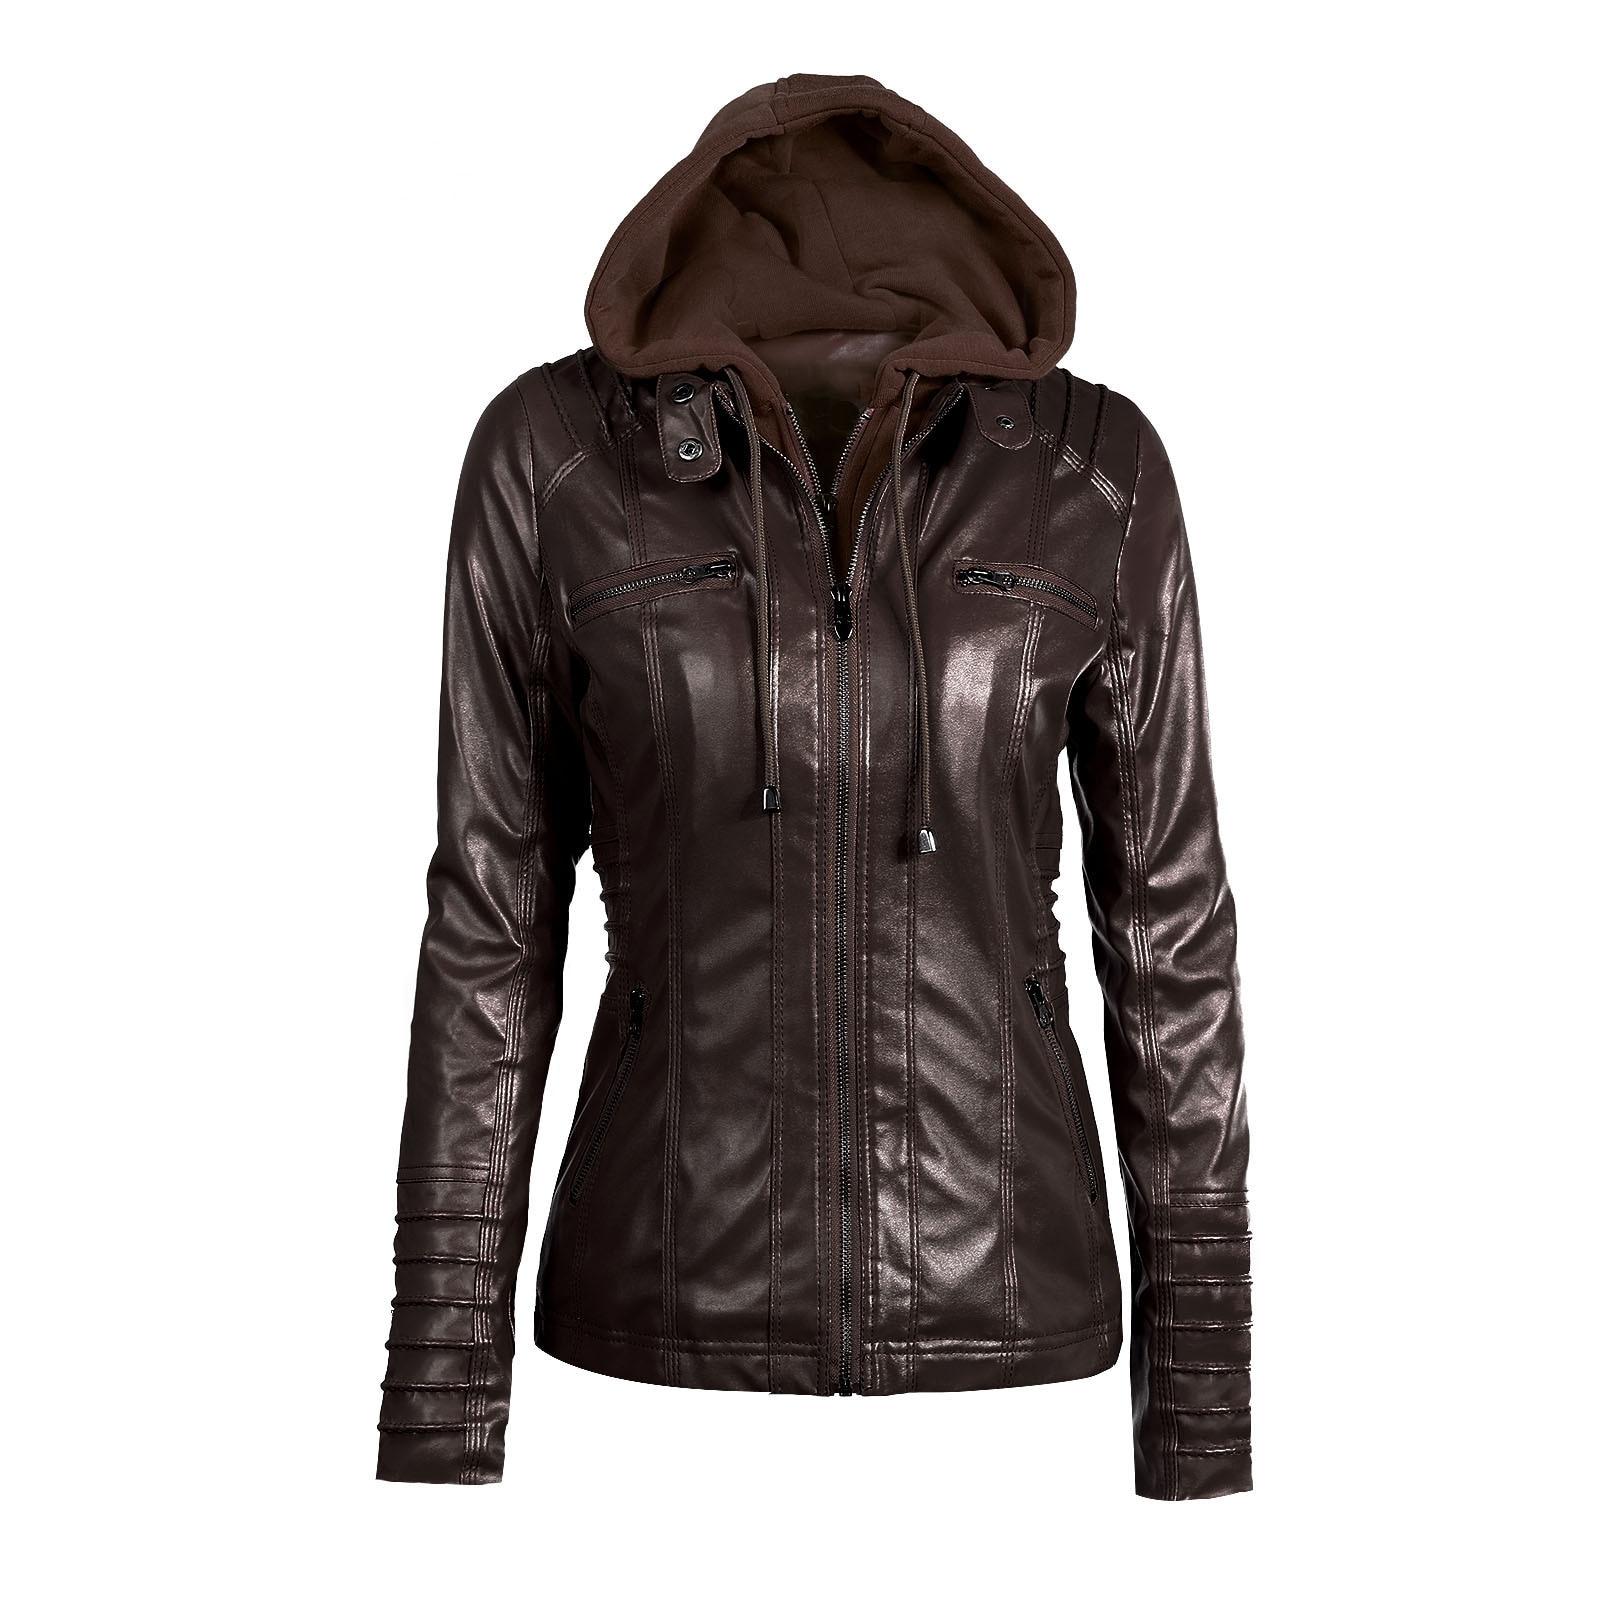 Riverdale Southside Riverdale Serpents black Brown PU Leather Jacket Women Riverdale Serpents Streetwear Leather Brand Coat 15